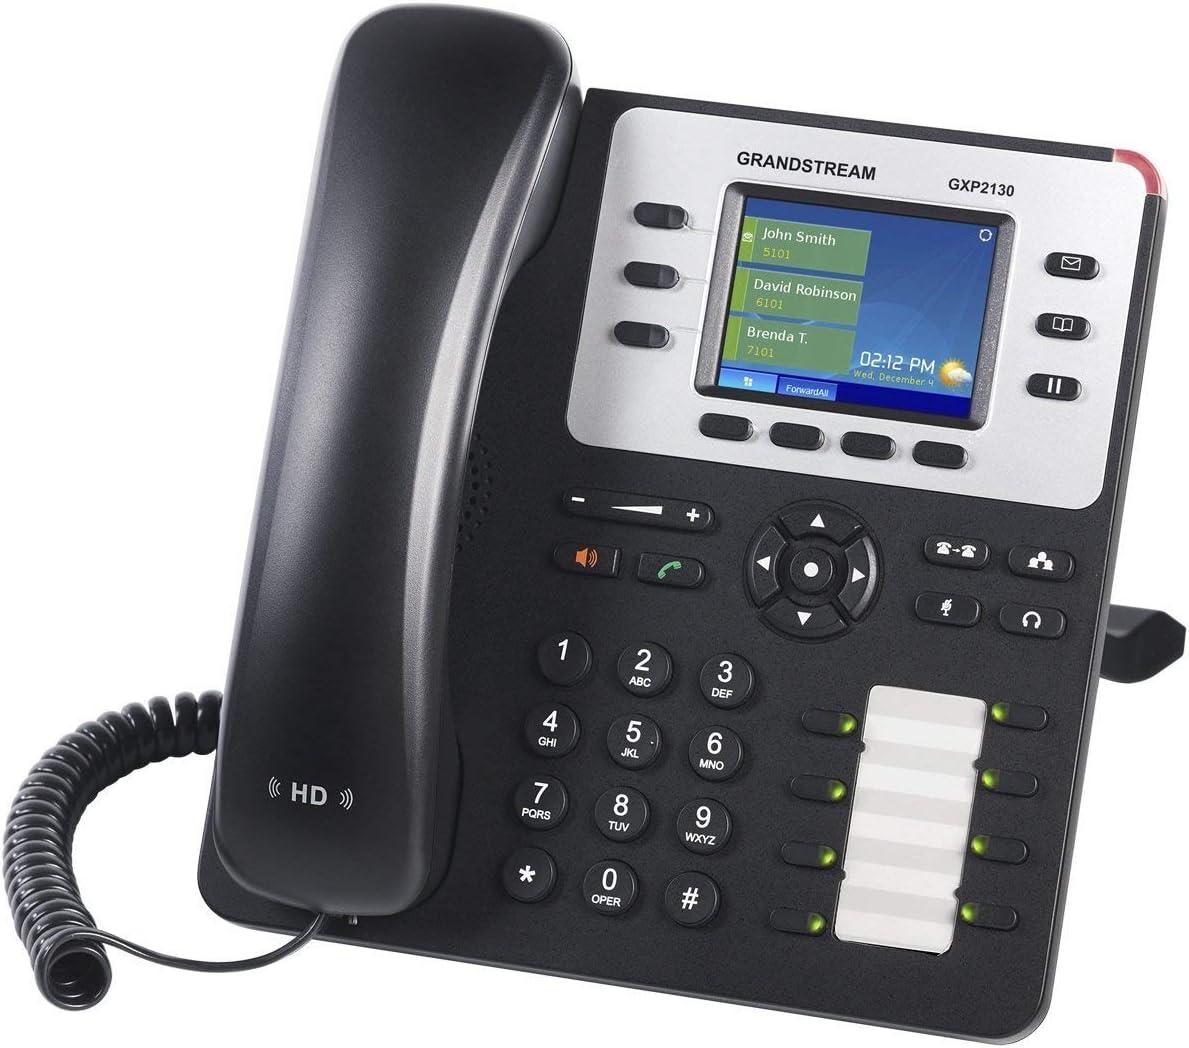 Grandstream Enterprise IP Telephone GXP2130 2.8 LCD, POE, Power Supply Included Renewed